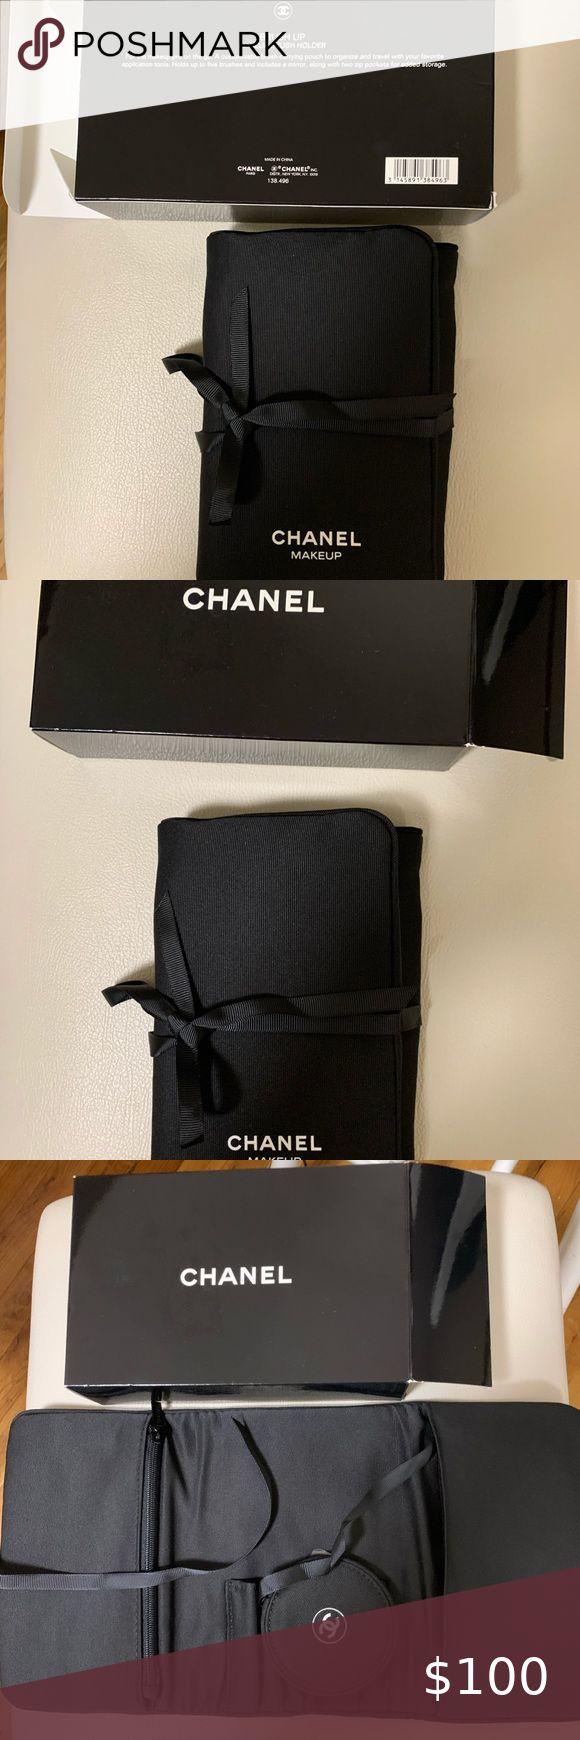 Chanel makeup brush holder in 2020 Chanel makeup, Makeup